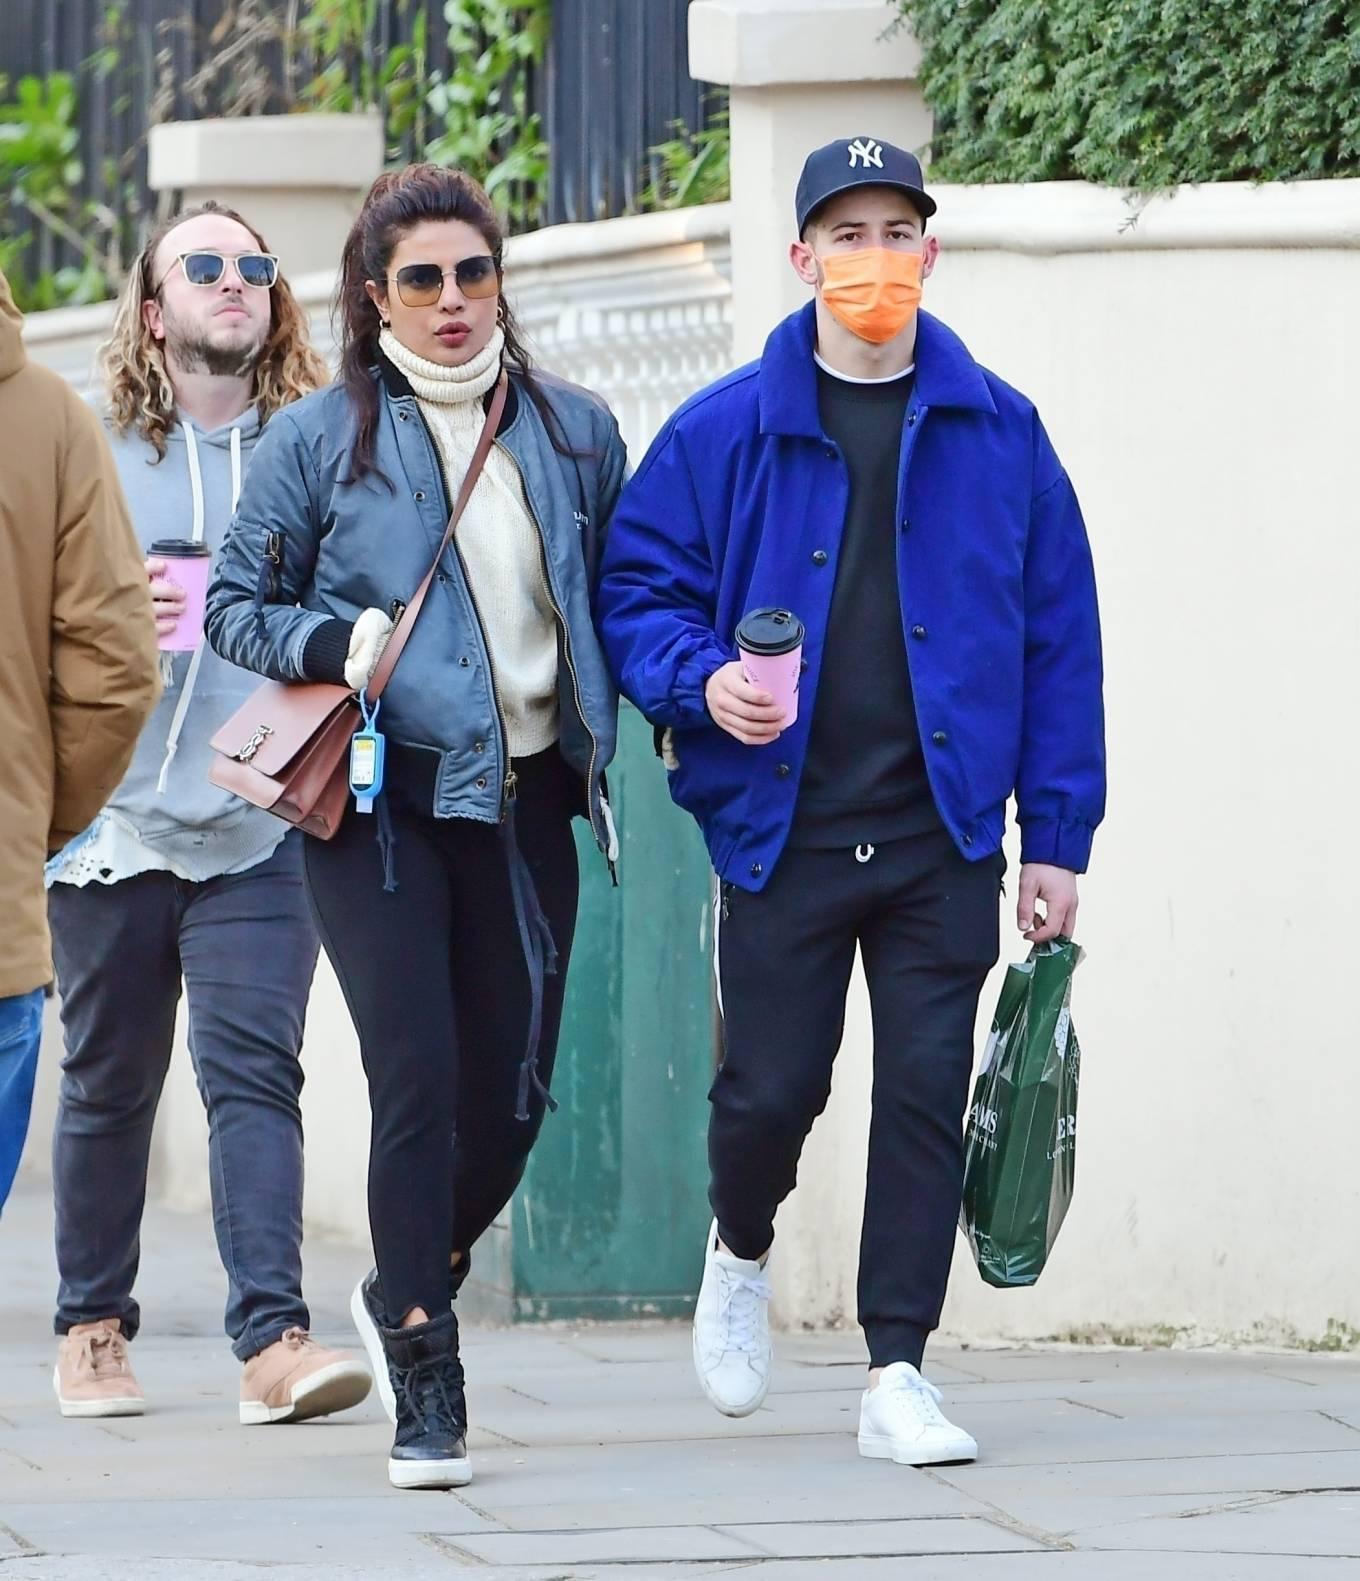 Priyanka Chopra – Seen out with family members in London